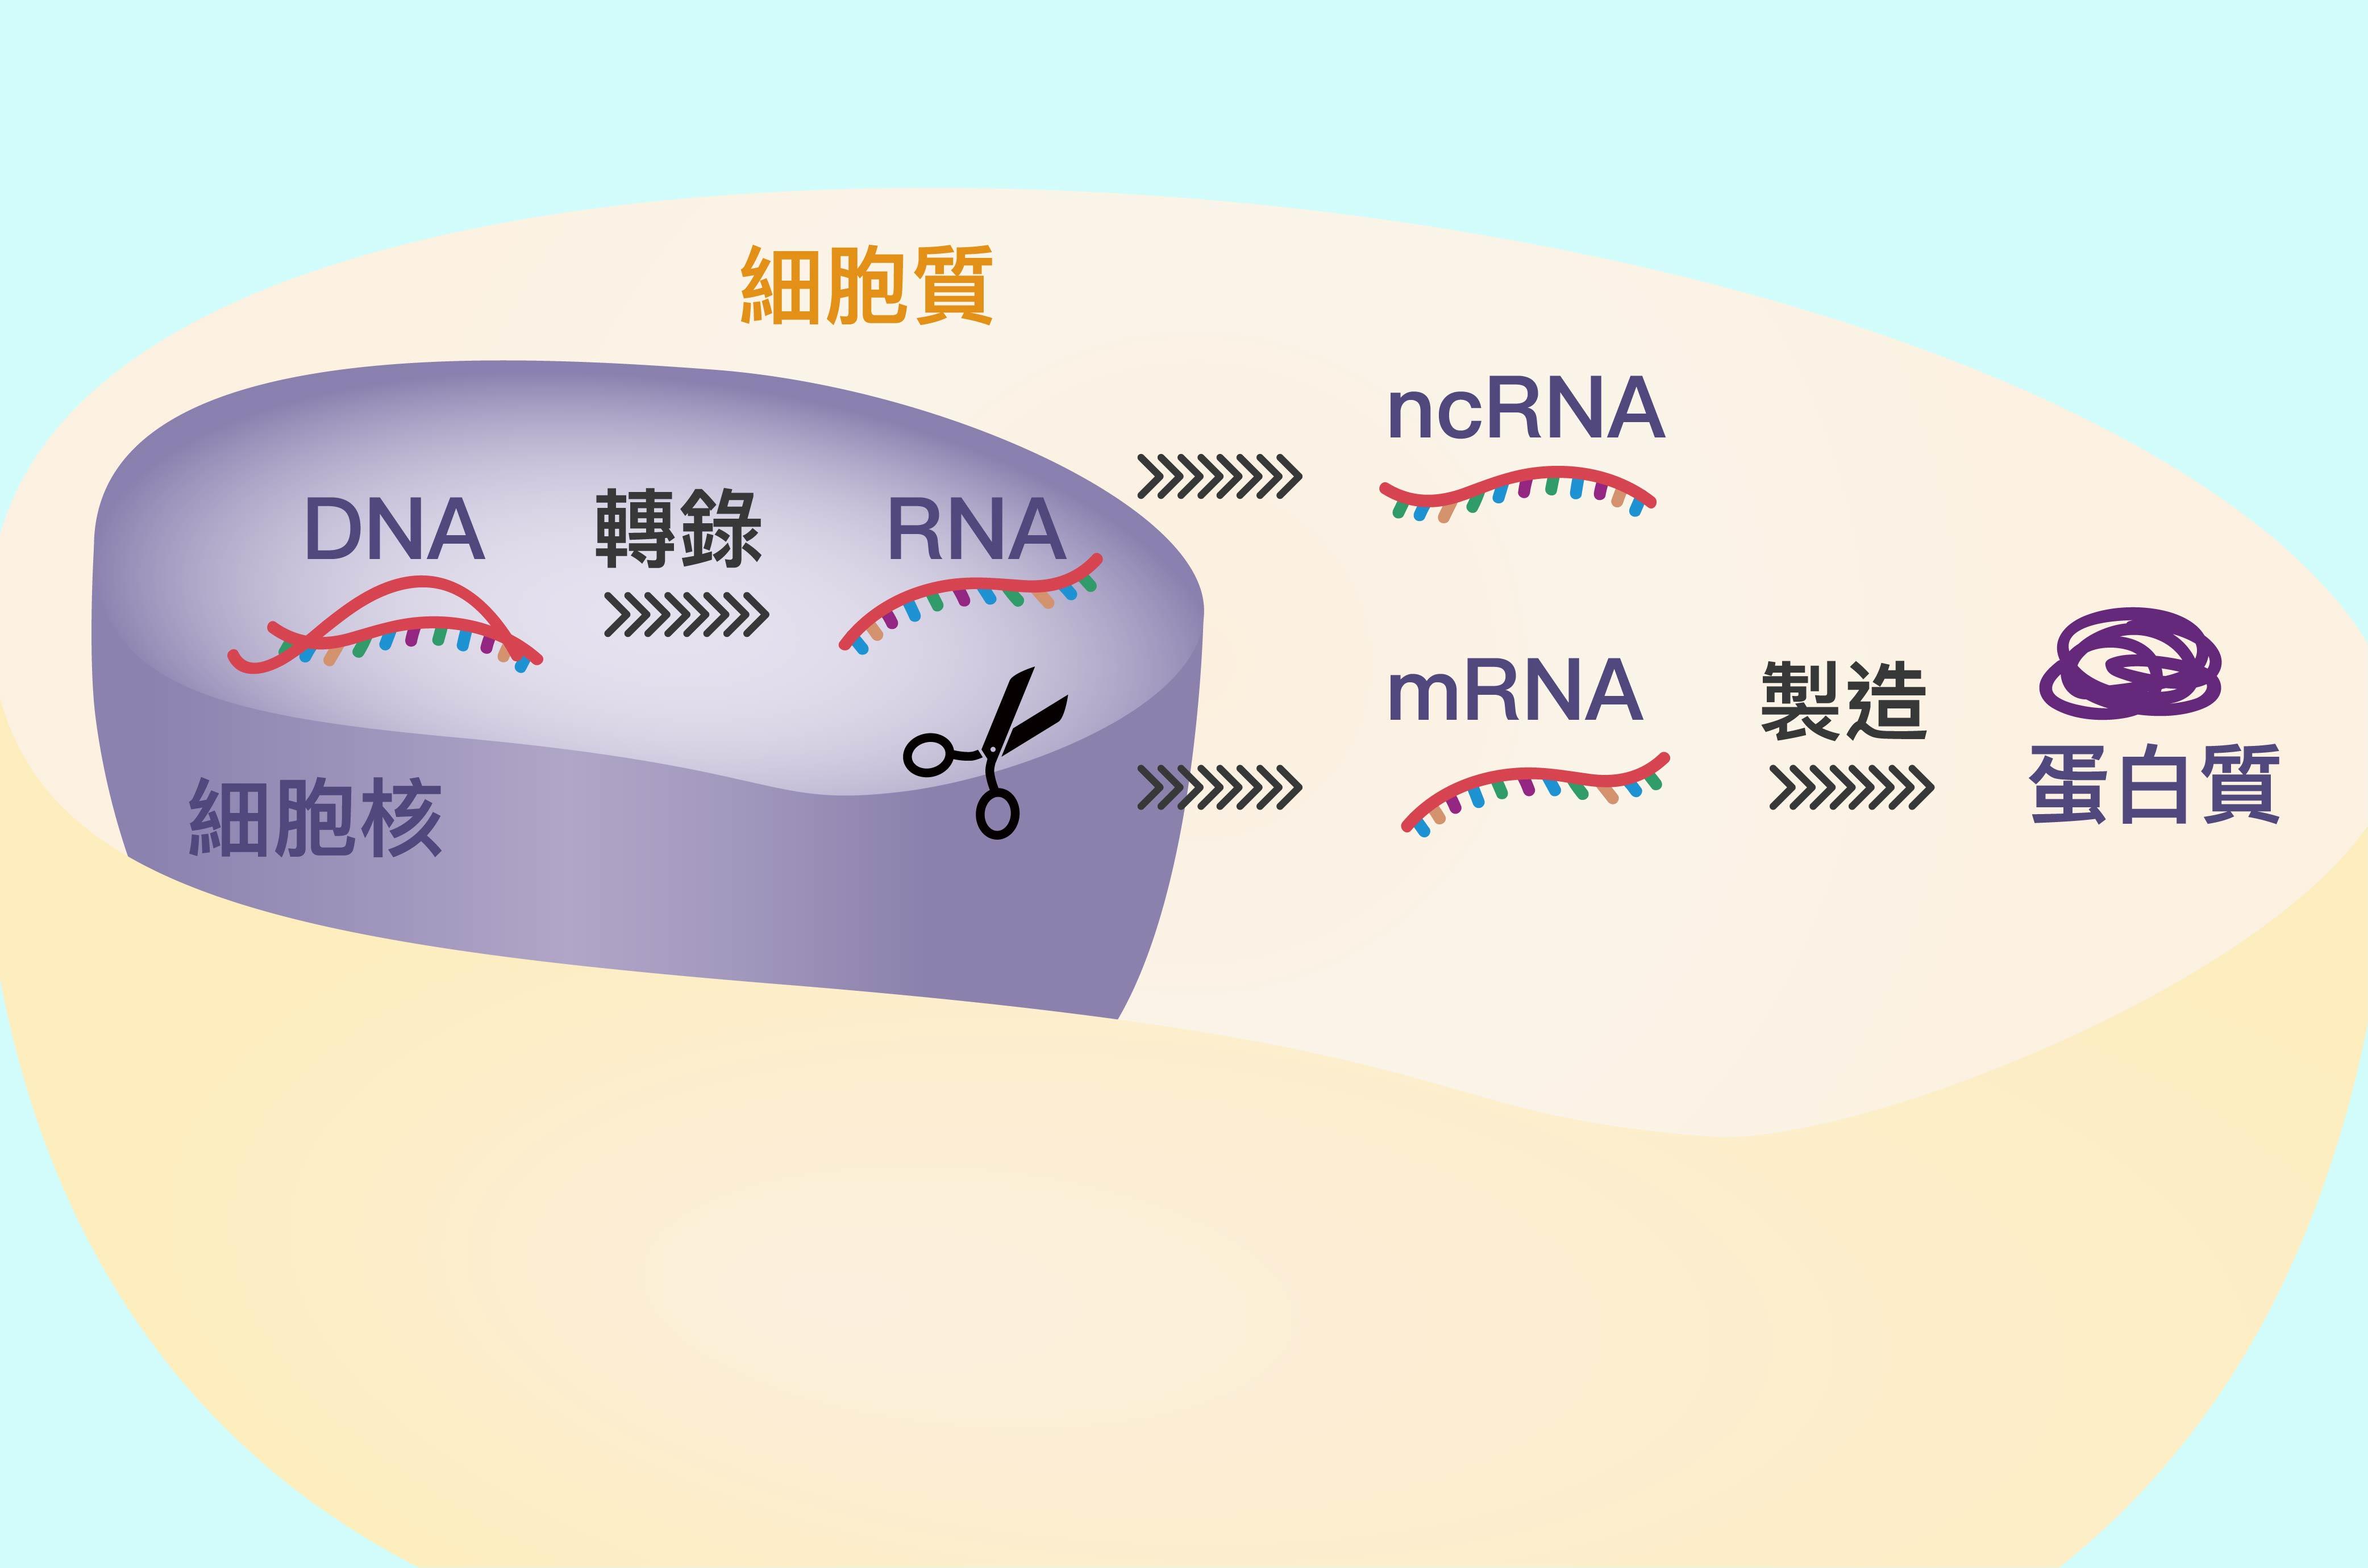 DNA 會先轉錄成 RNA ,再剪接加工為成熟 mRNA,並送去細胞質製造蛋白質。(圖中剪刀為 RNA 剪接的示意位置。) 圖說設計│林婷嫻、張語辰